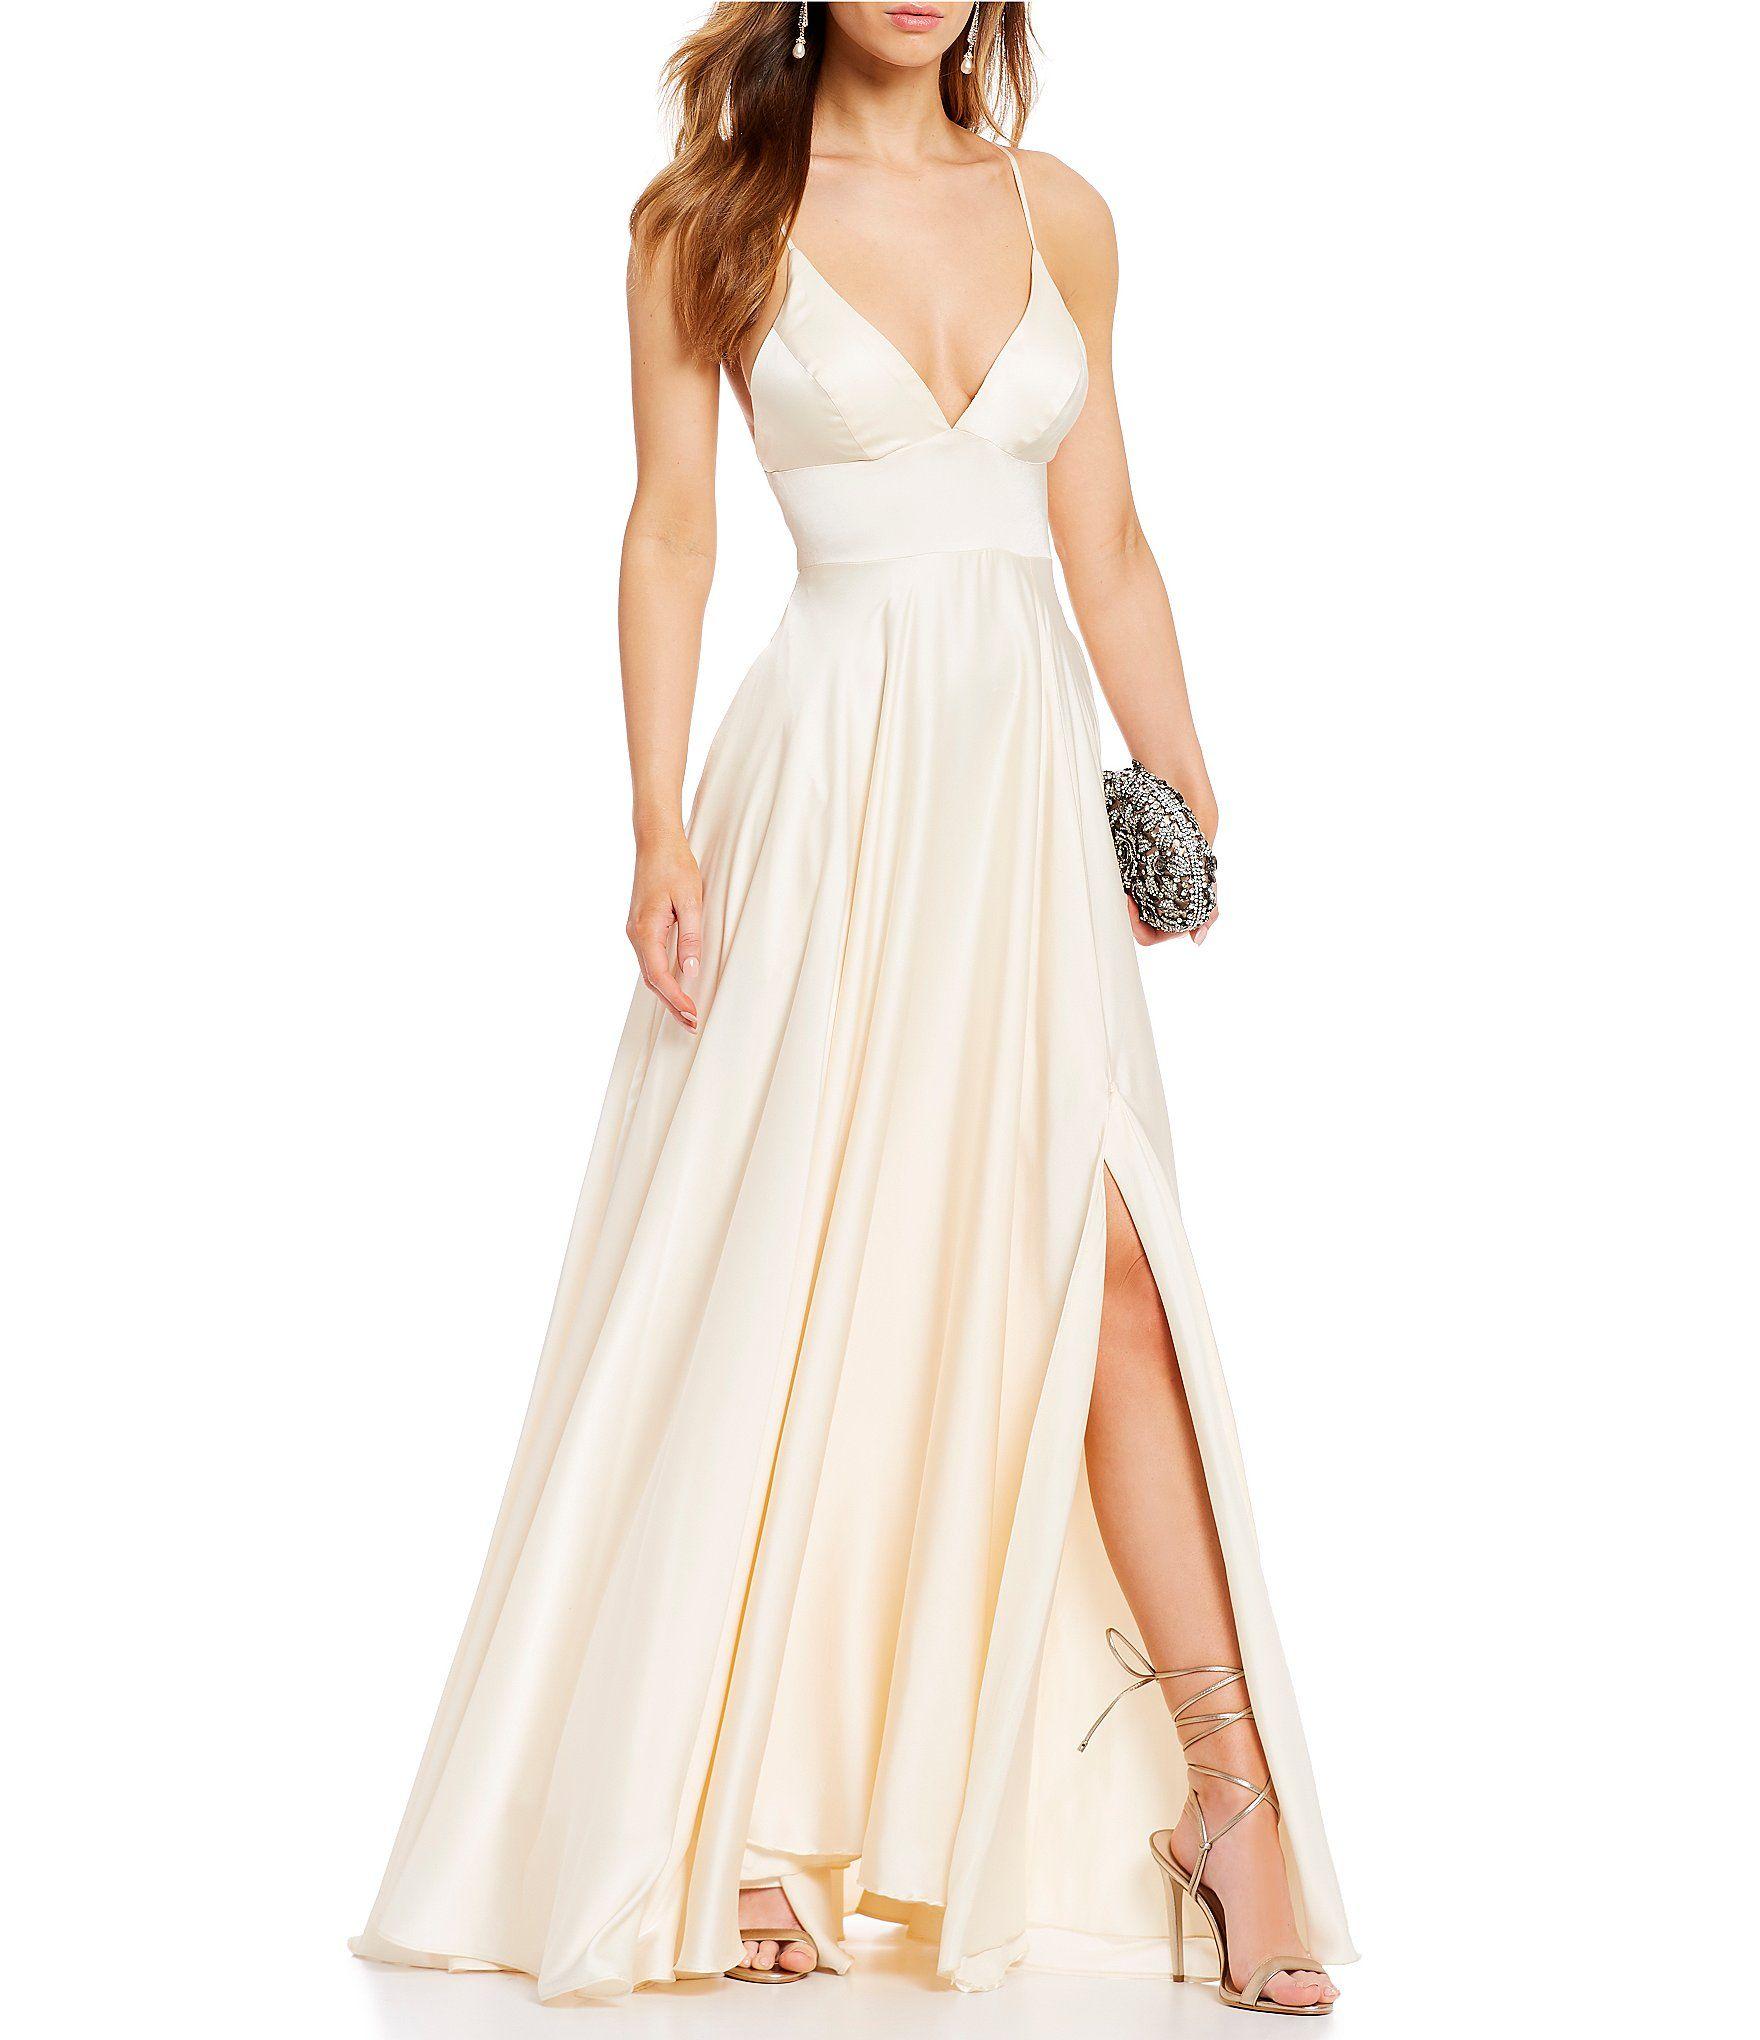 4bb2776cfb Shop for B. Darlin Deep V-Neck Satin A-Line Dress at Dillards.com. Visit  Dillards.com to find clothing